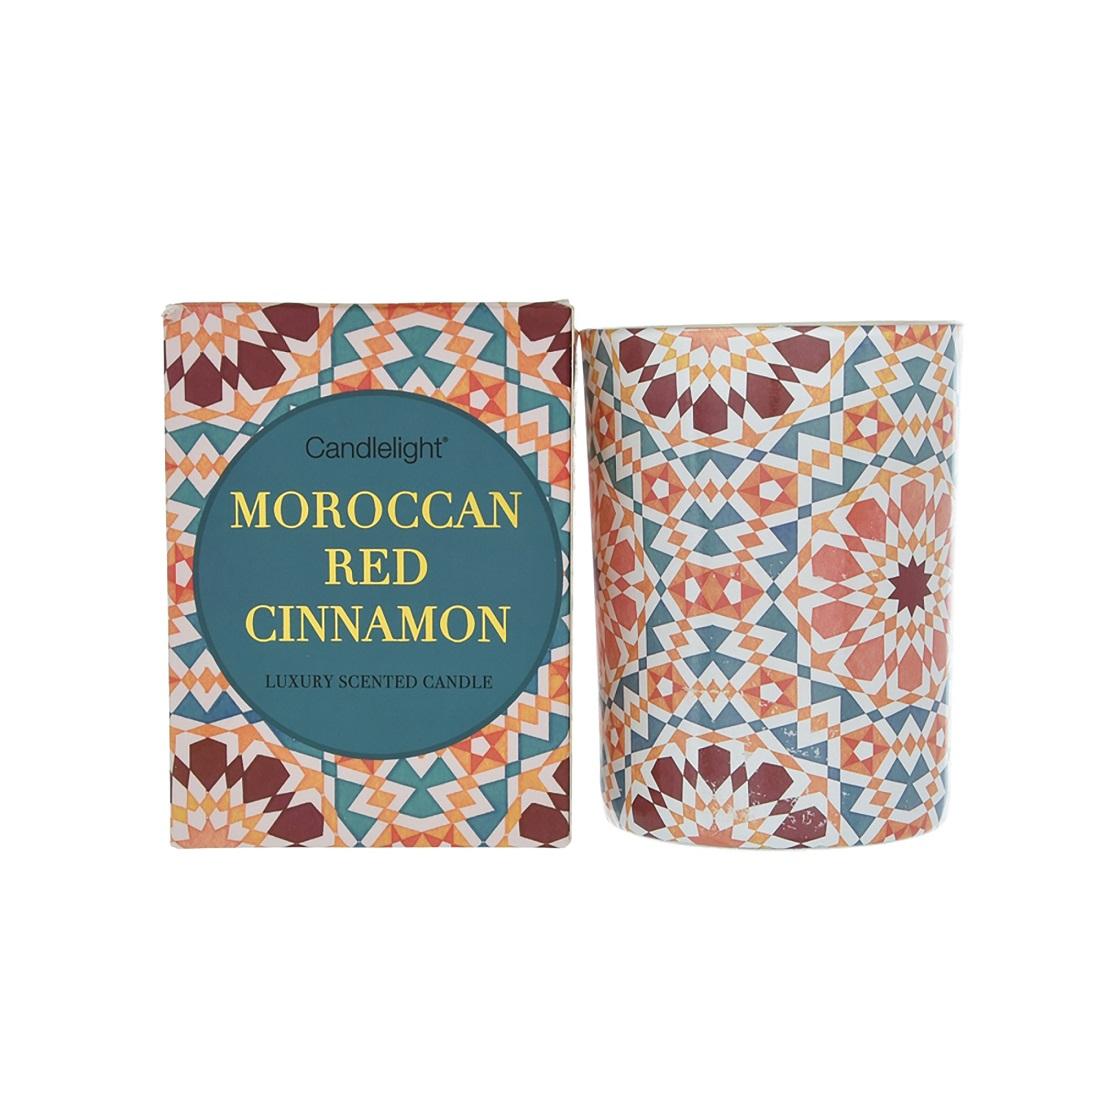 Moroccan Cinnamon Small Candle